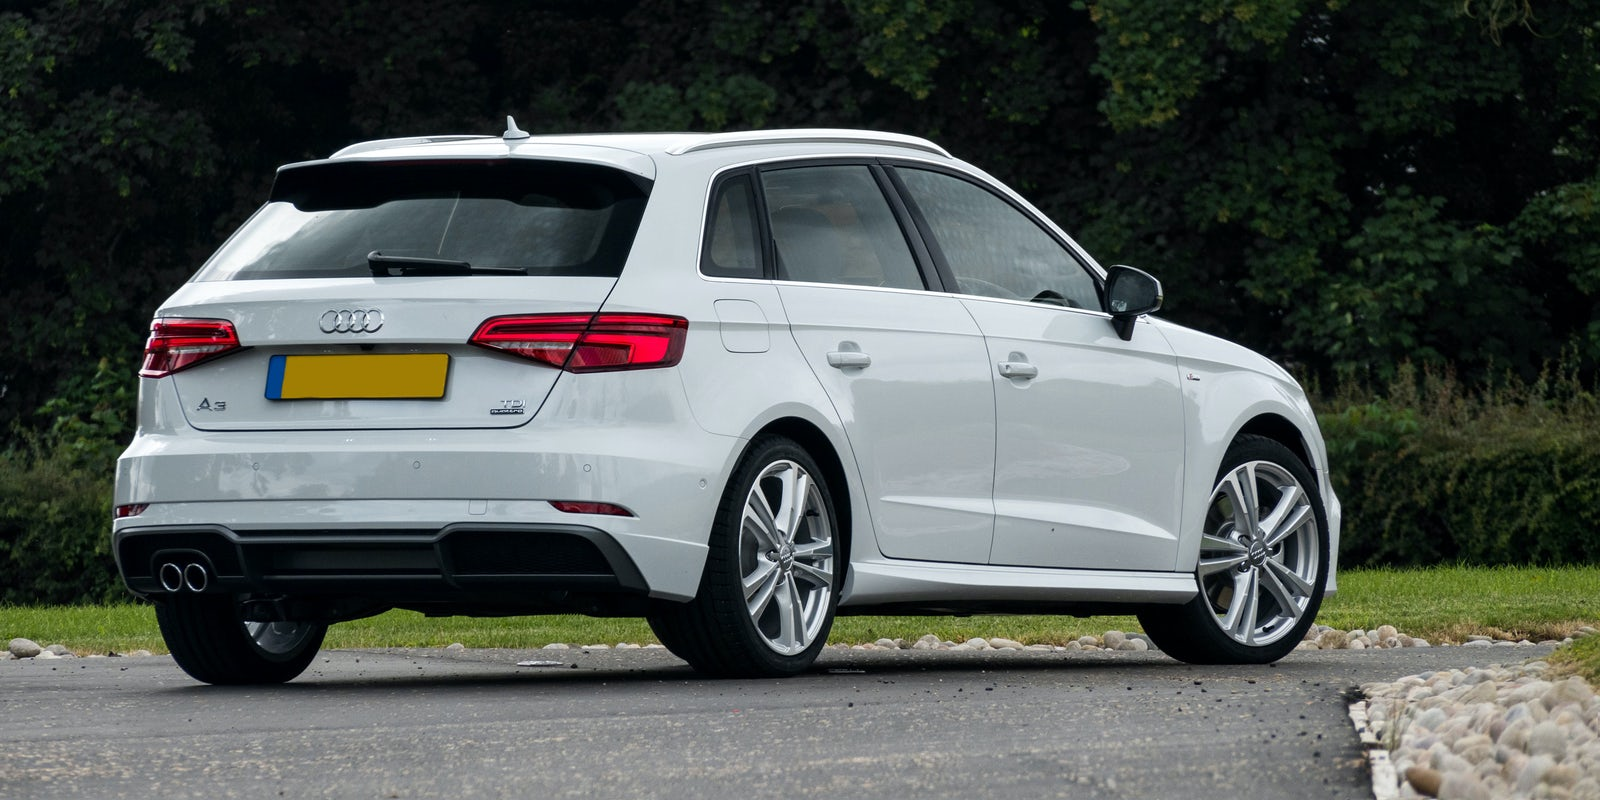 Audi A Sportback Review Carwow - Audi a3 sport